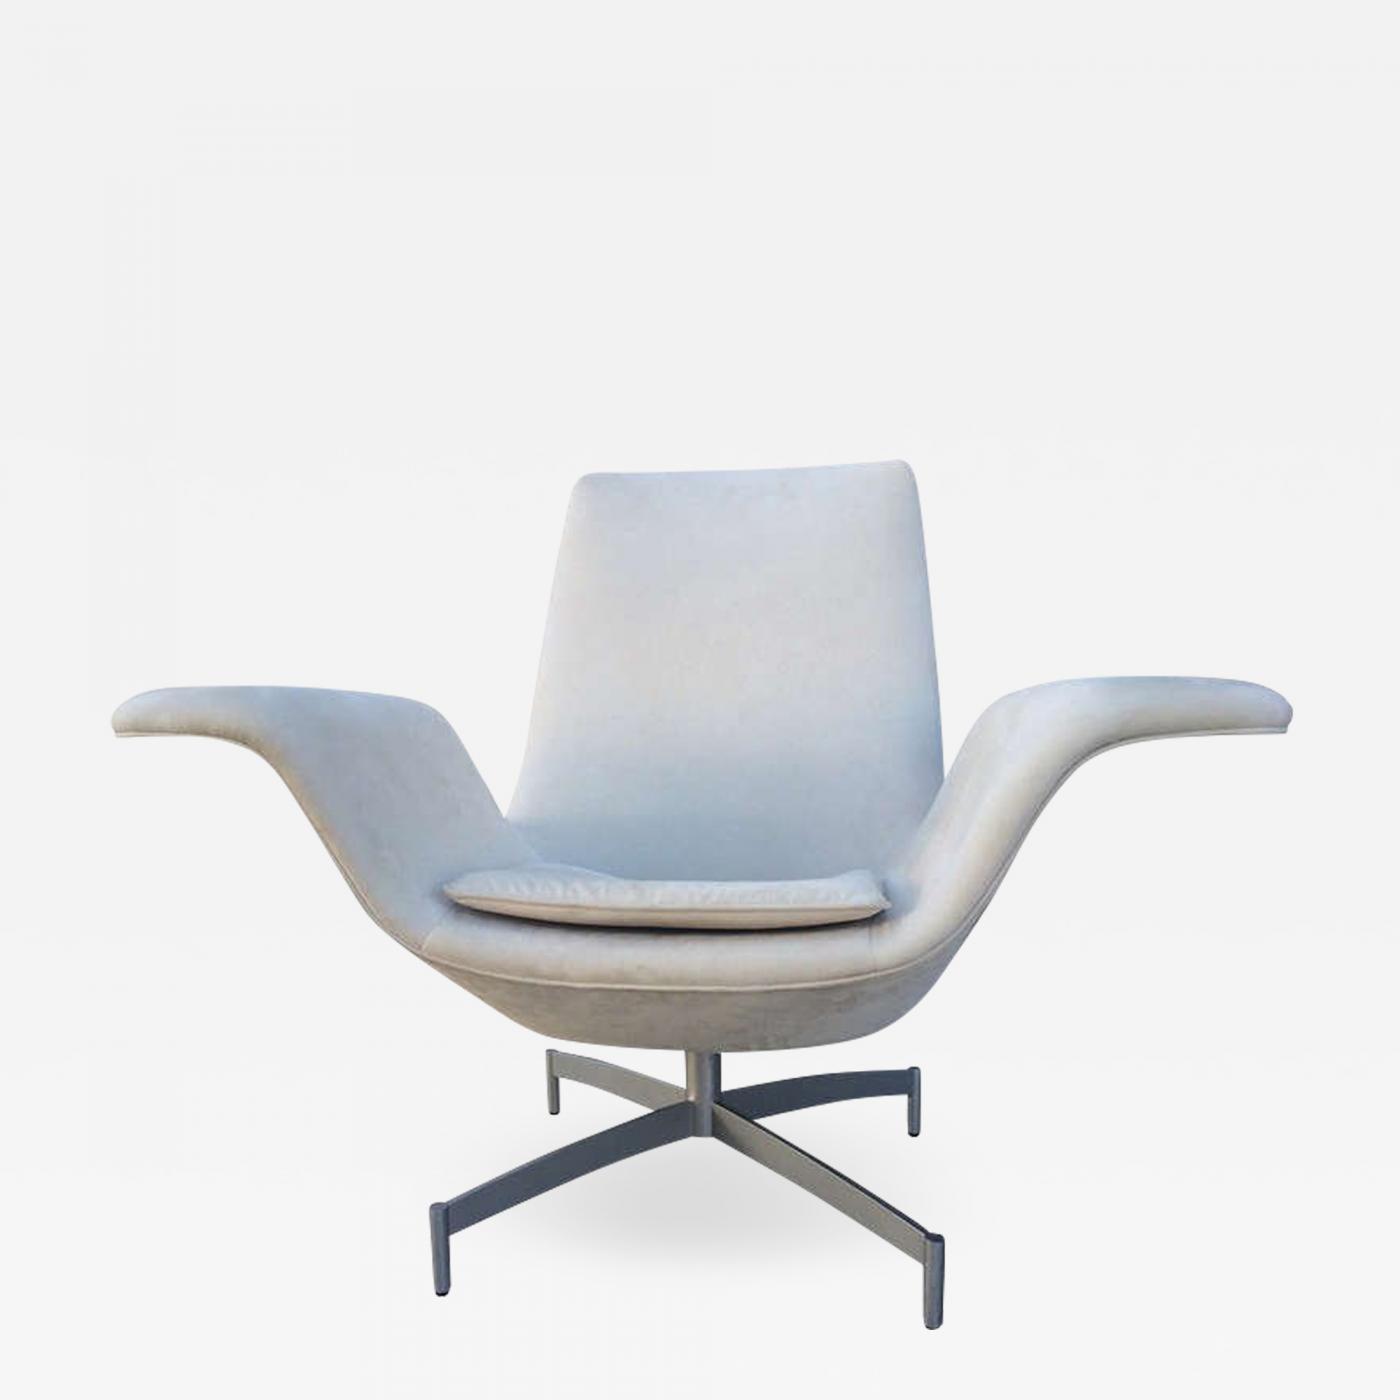 Hbf Furniture Hickory Business Furniture Dialogue